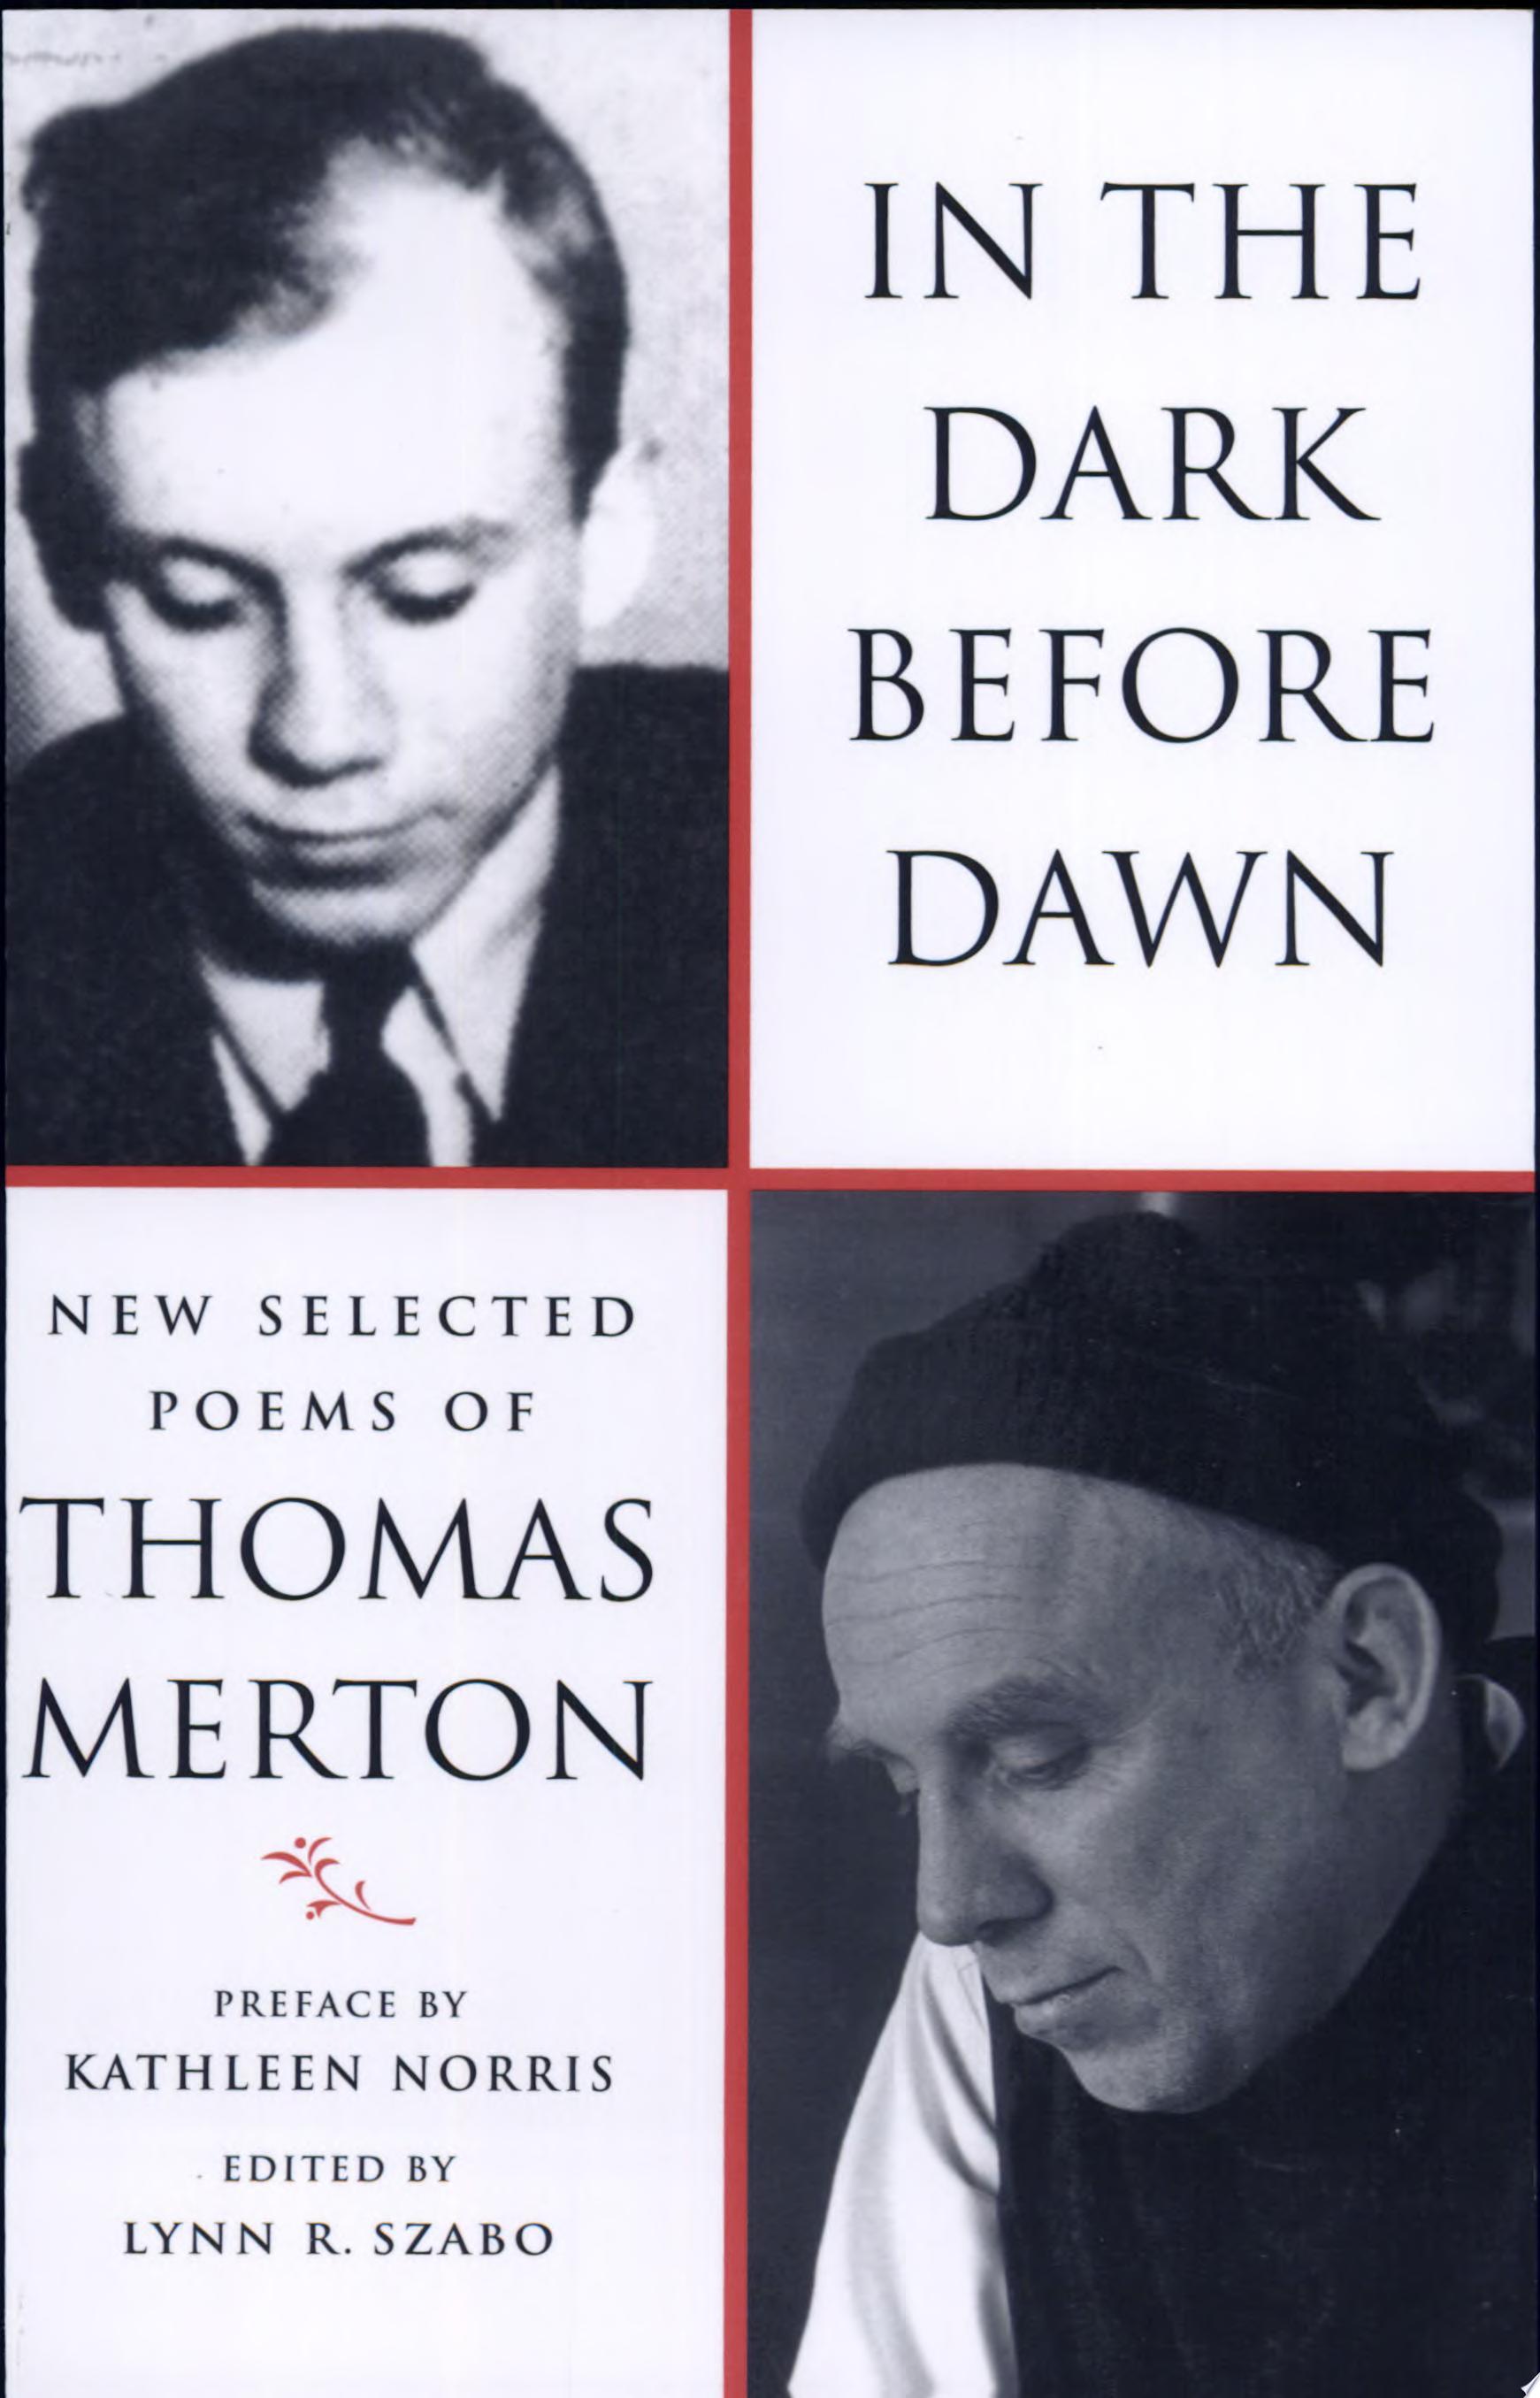 In the Dark Before Dawn